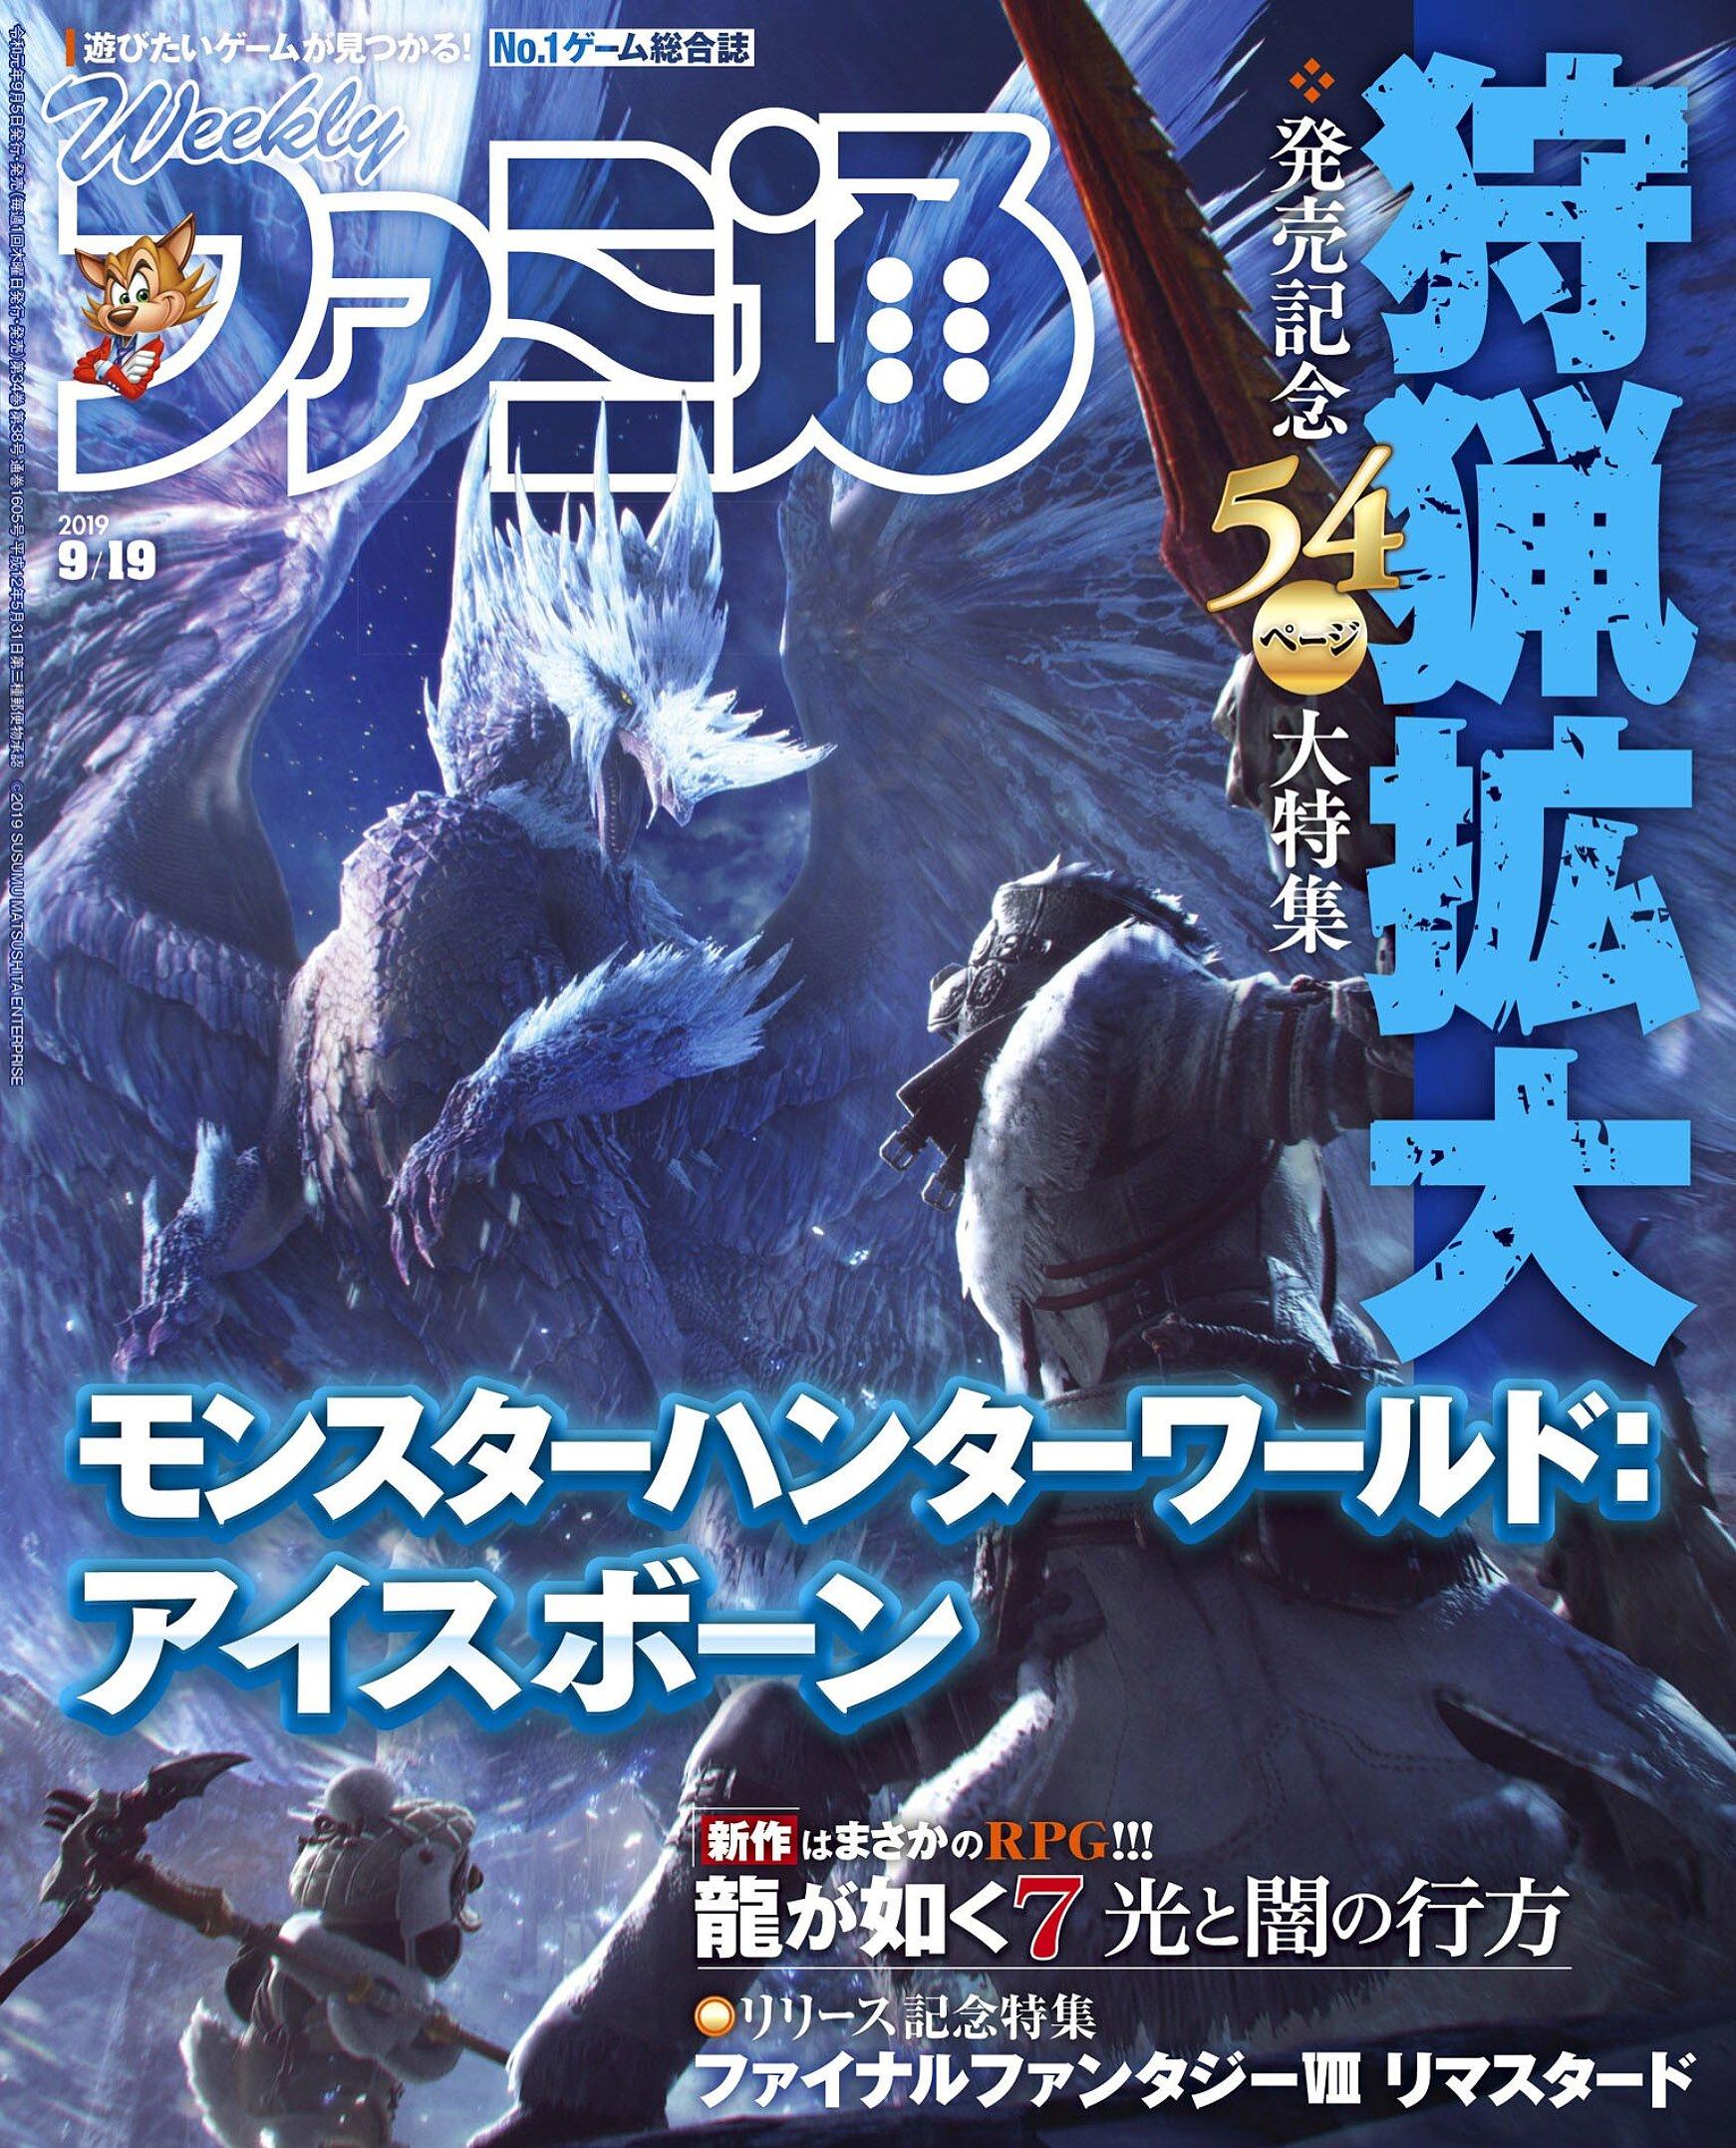 Famitsu 1605 (September 19, 2019)